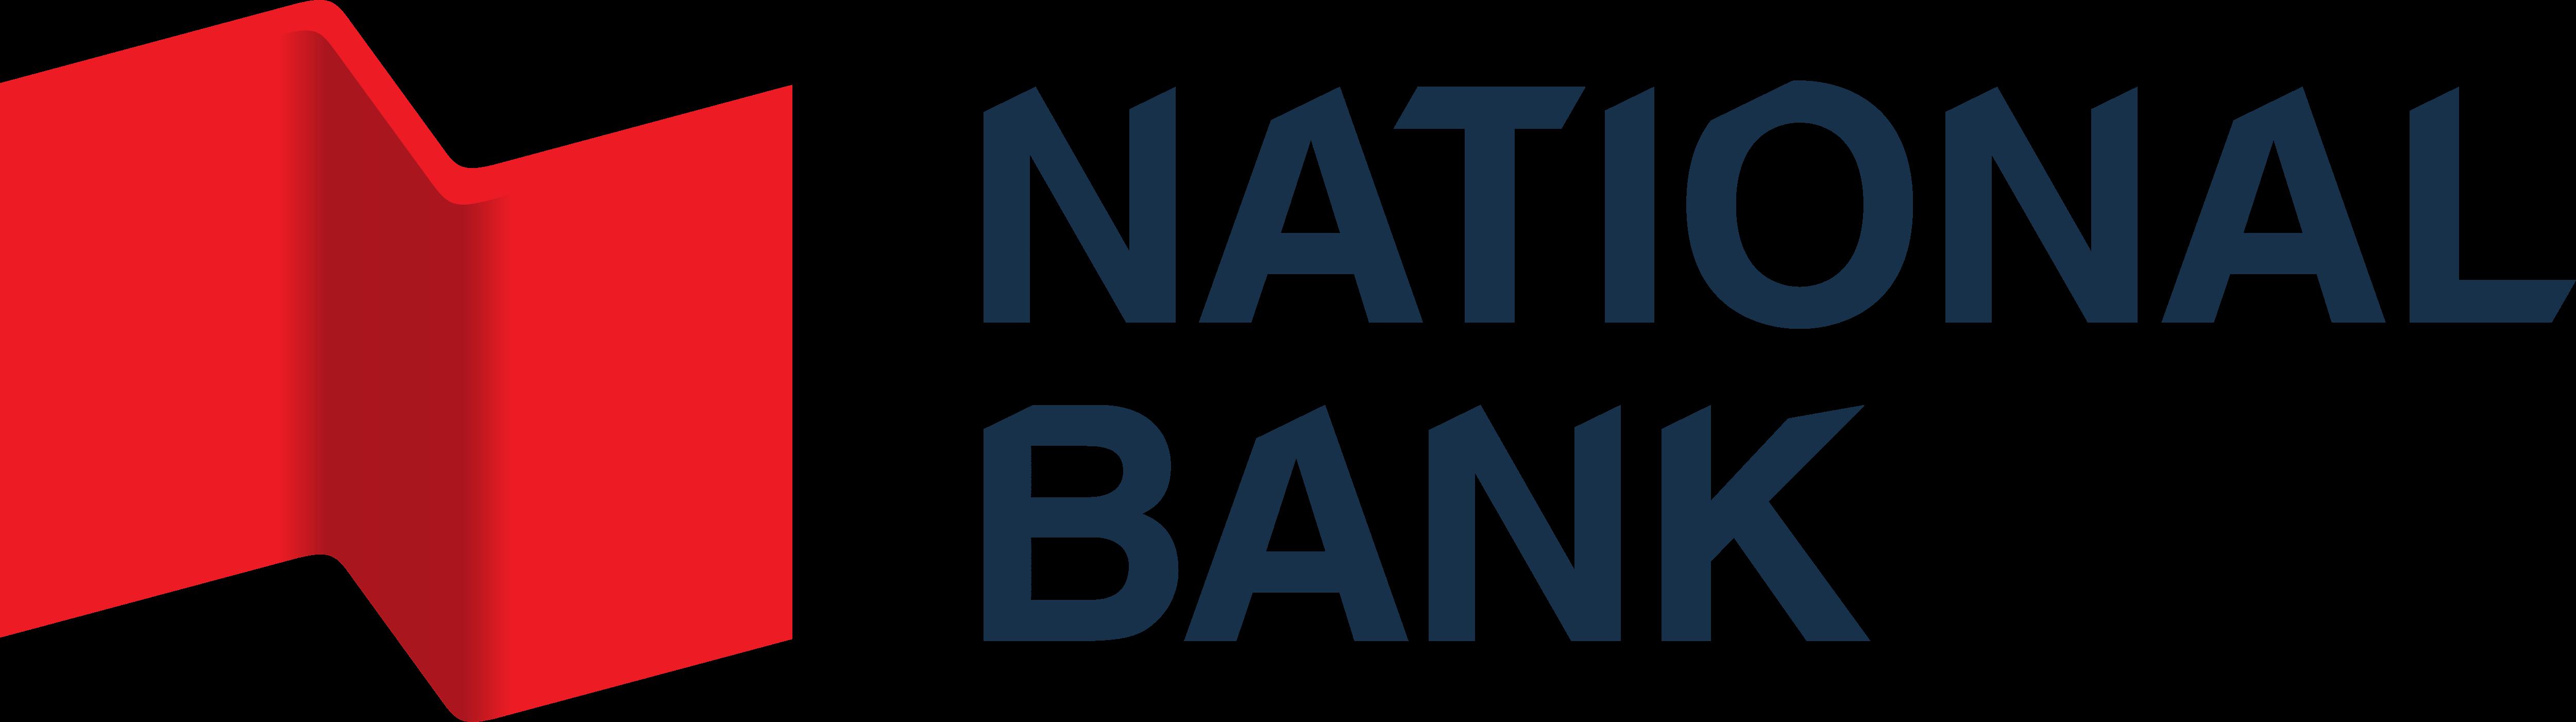 logo-national-bank